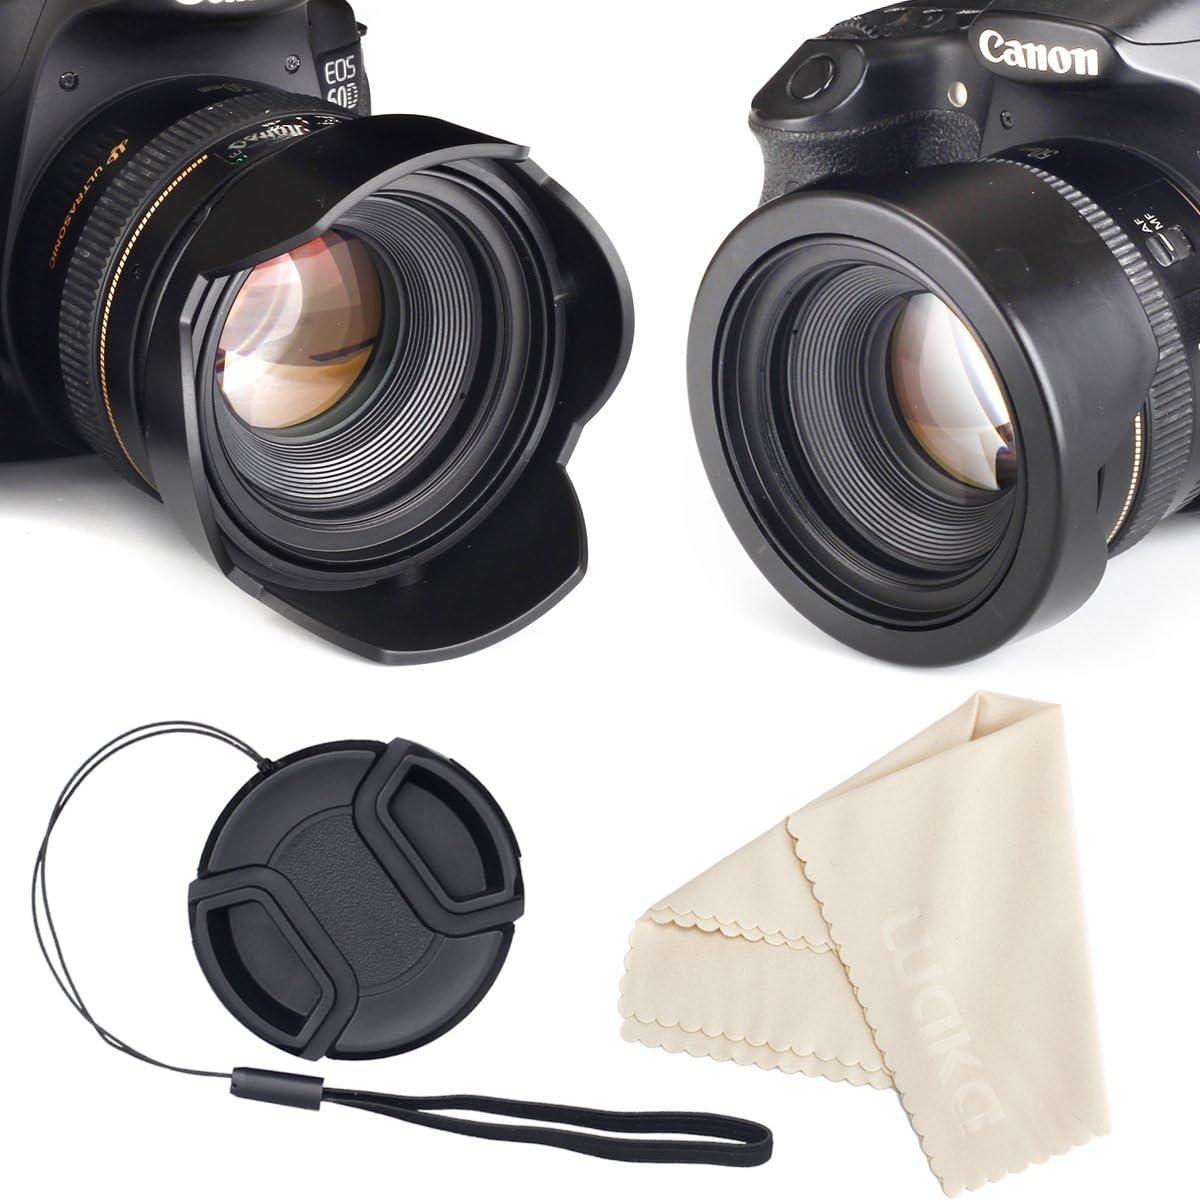 + Nwv Direct Microfiber Cleaning Cloth. Nikon D3200 Pro Digital Lens Hood Flower Design 52mm